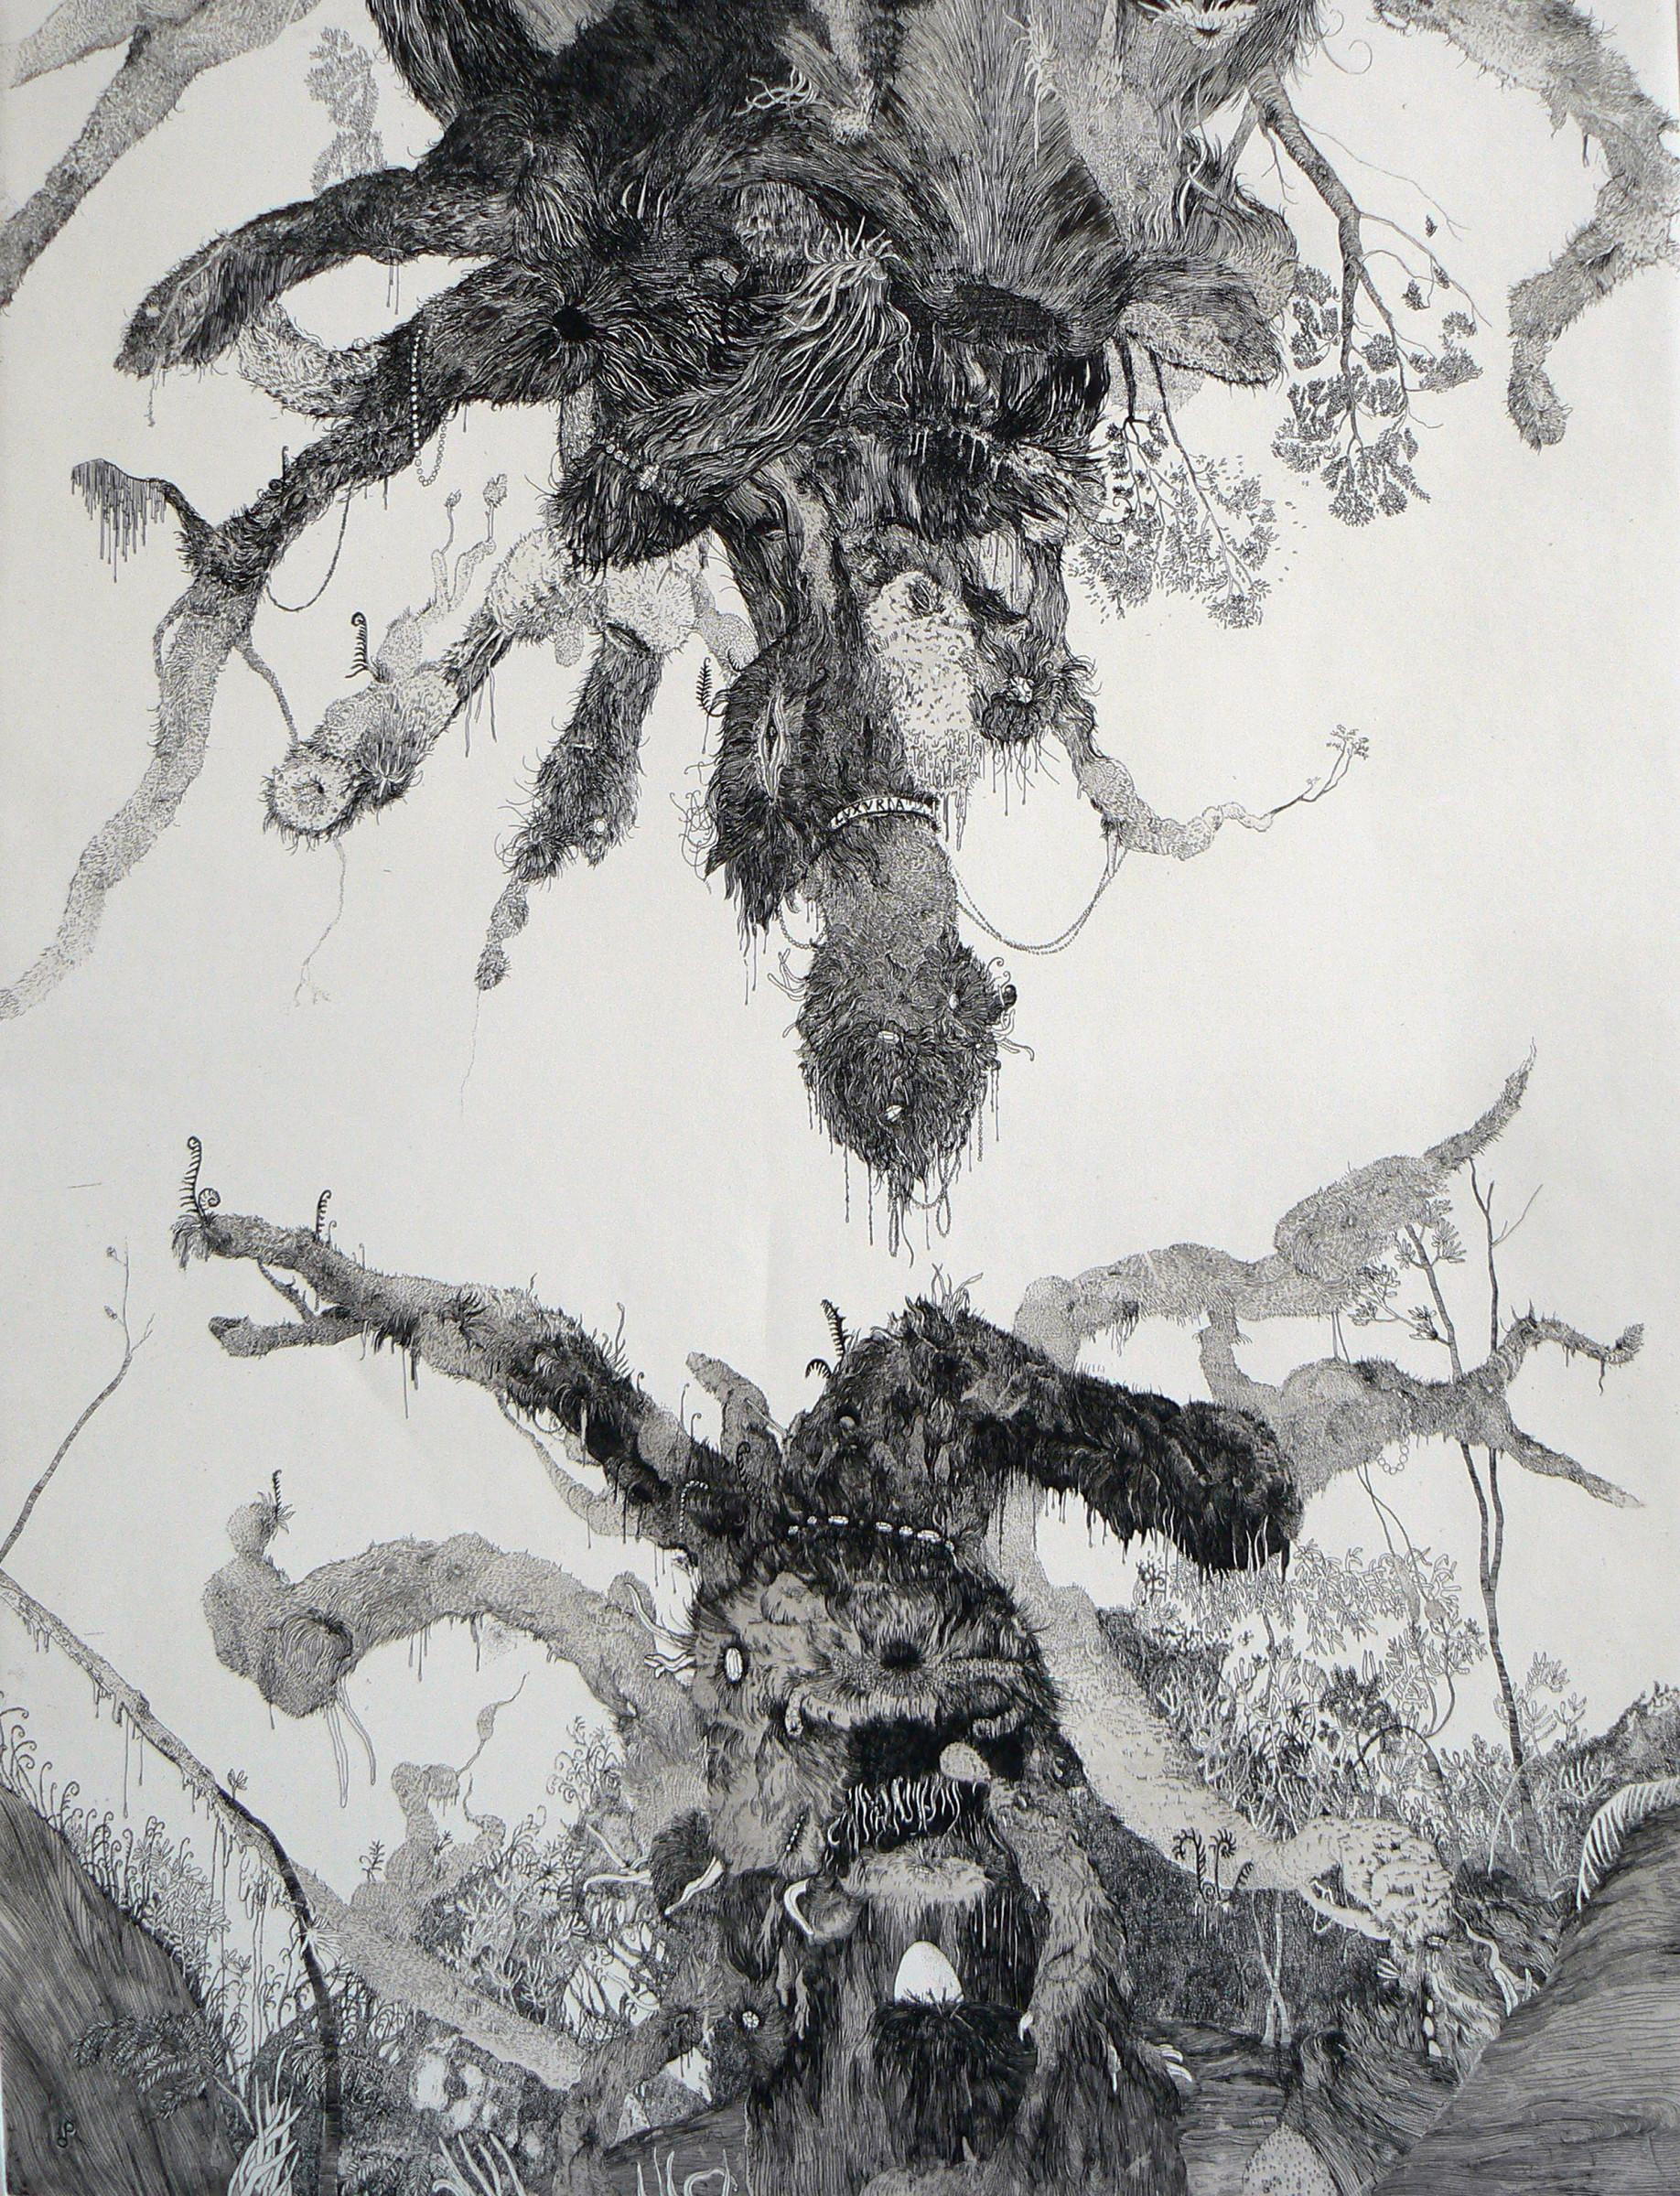 <span class=&#34;link fancybox-details-link&#34;><a href=&#34;/content/viewing-room/29/artworks864/&#34;>View Detail Page</a></span><div class=&#34;artist&#34;><strong>David Price</strong></div> b.1972<div class=&#34;title&#34;><em>Luxuria</em>, 2009</div><div class=&#34;medium&#34;>Etching - edition of 25</div><div class=&#34;dimensions&#34;>100 x 78cm</div>£ 600.00